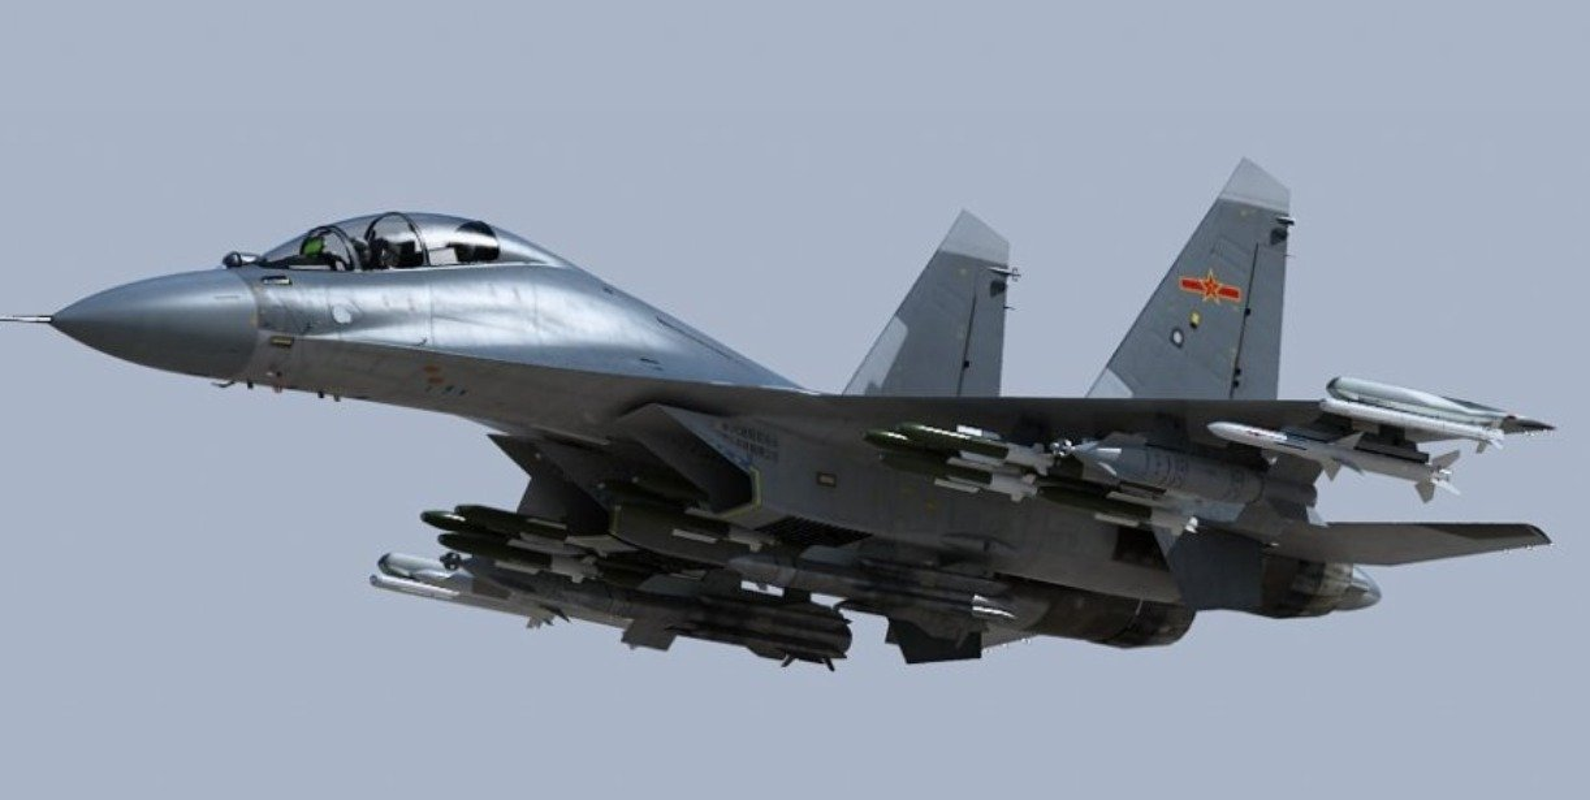 May bay tac chien dien tu J-16D Trung Quoc co de doa duoc My?-Hinh-5